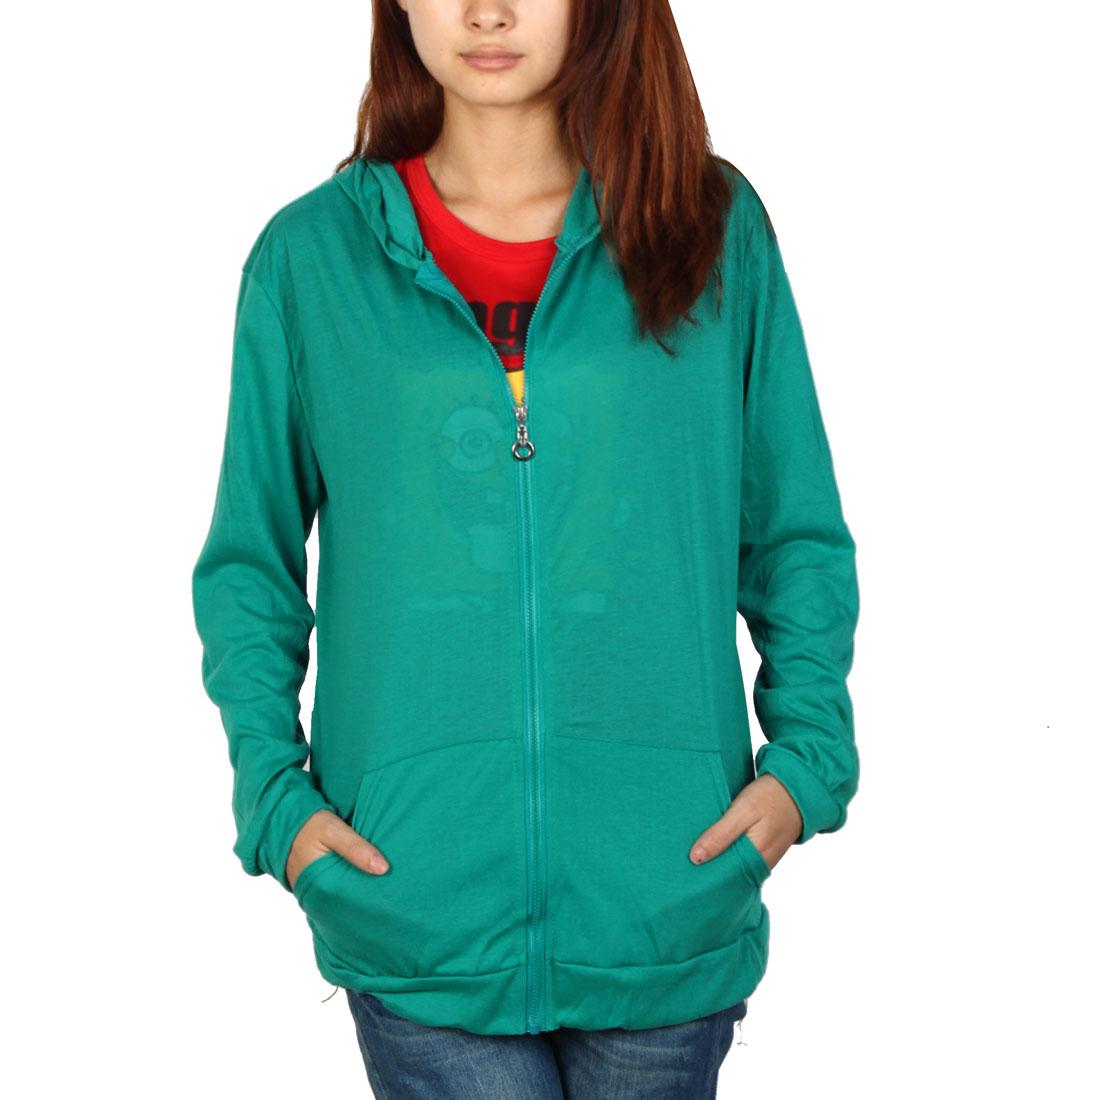 L Women Hooded Zip Front Long Sleeve Slant Pockets Simple Hoodies Green